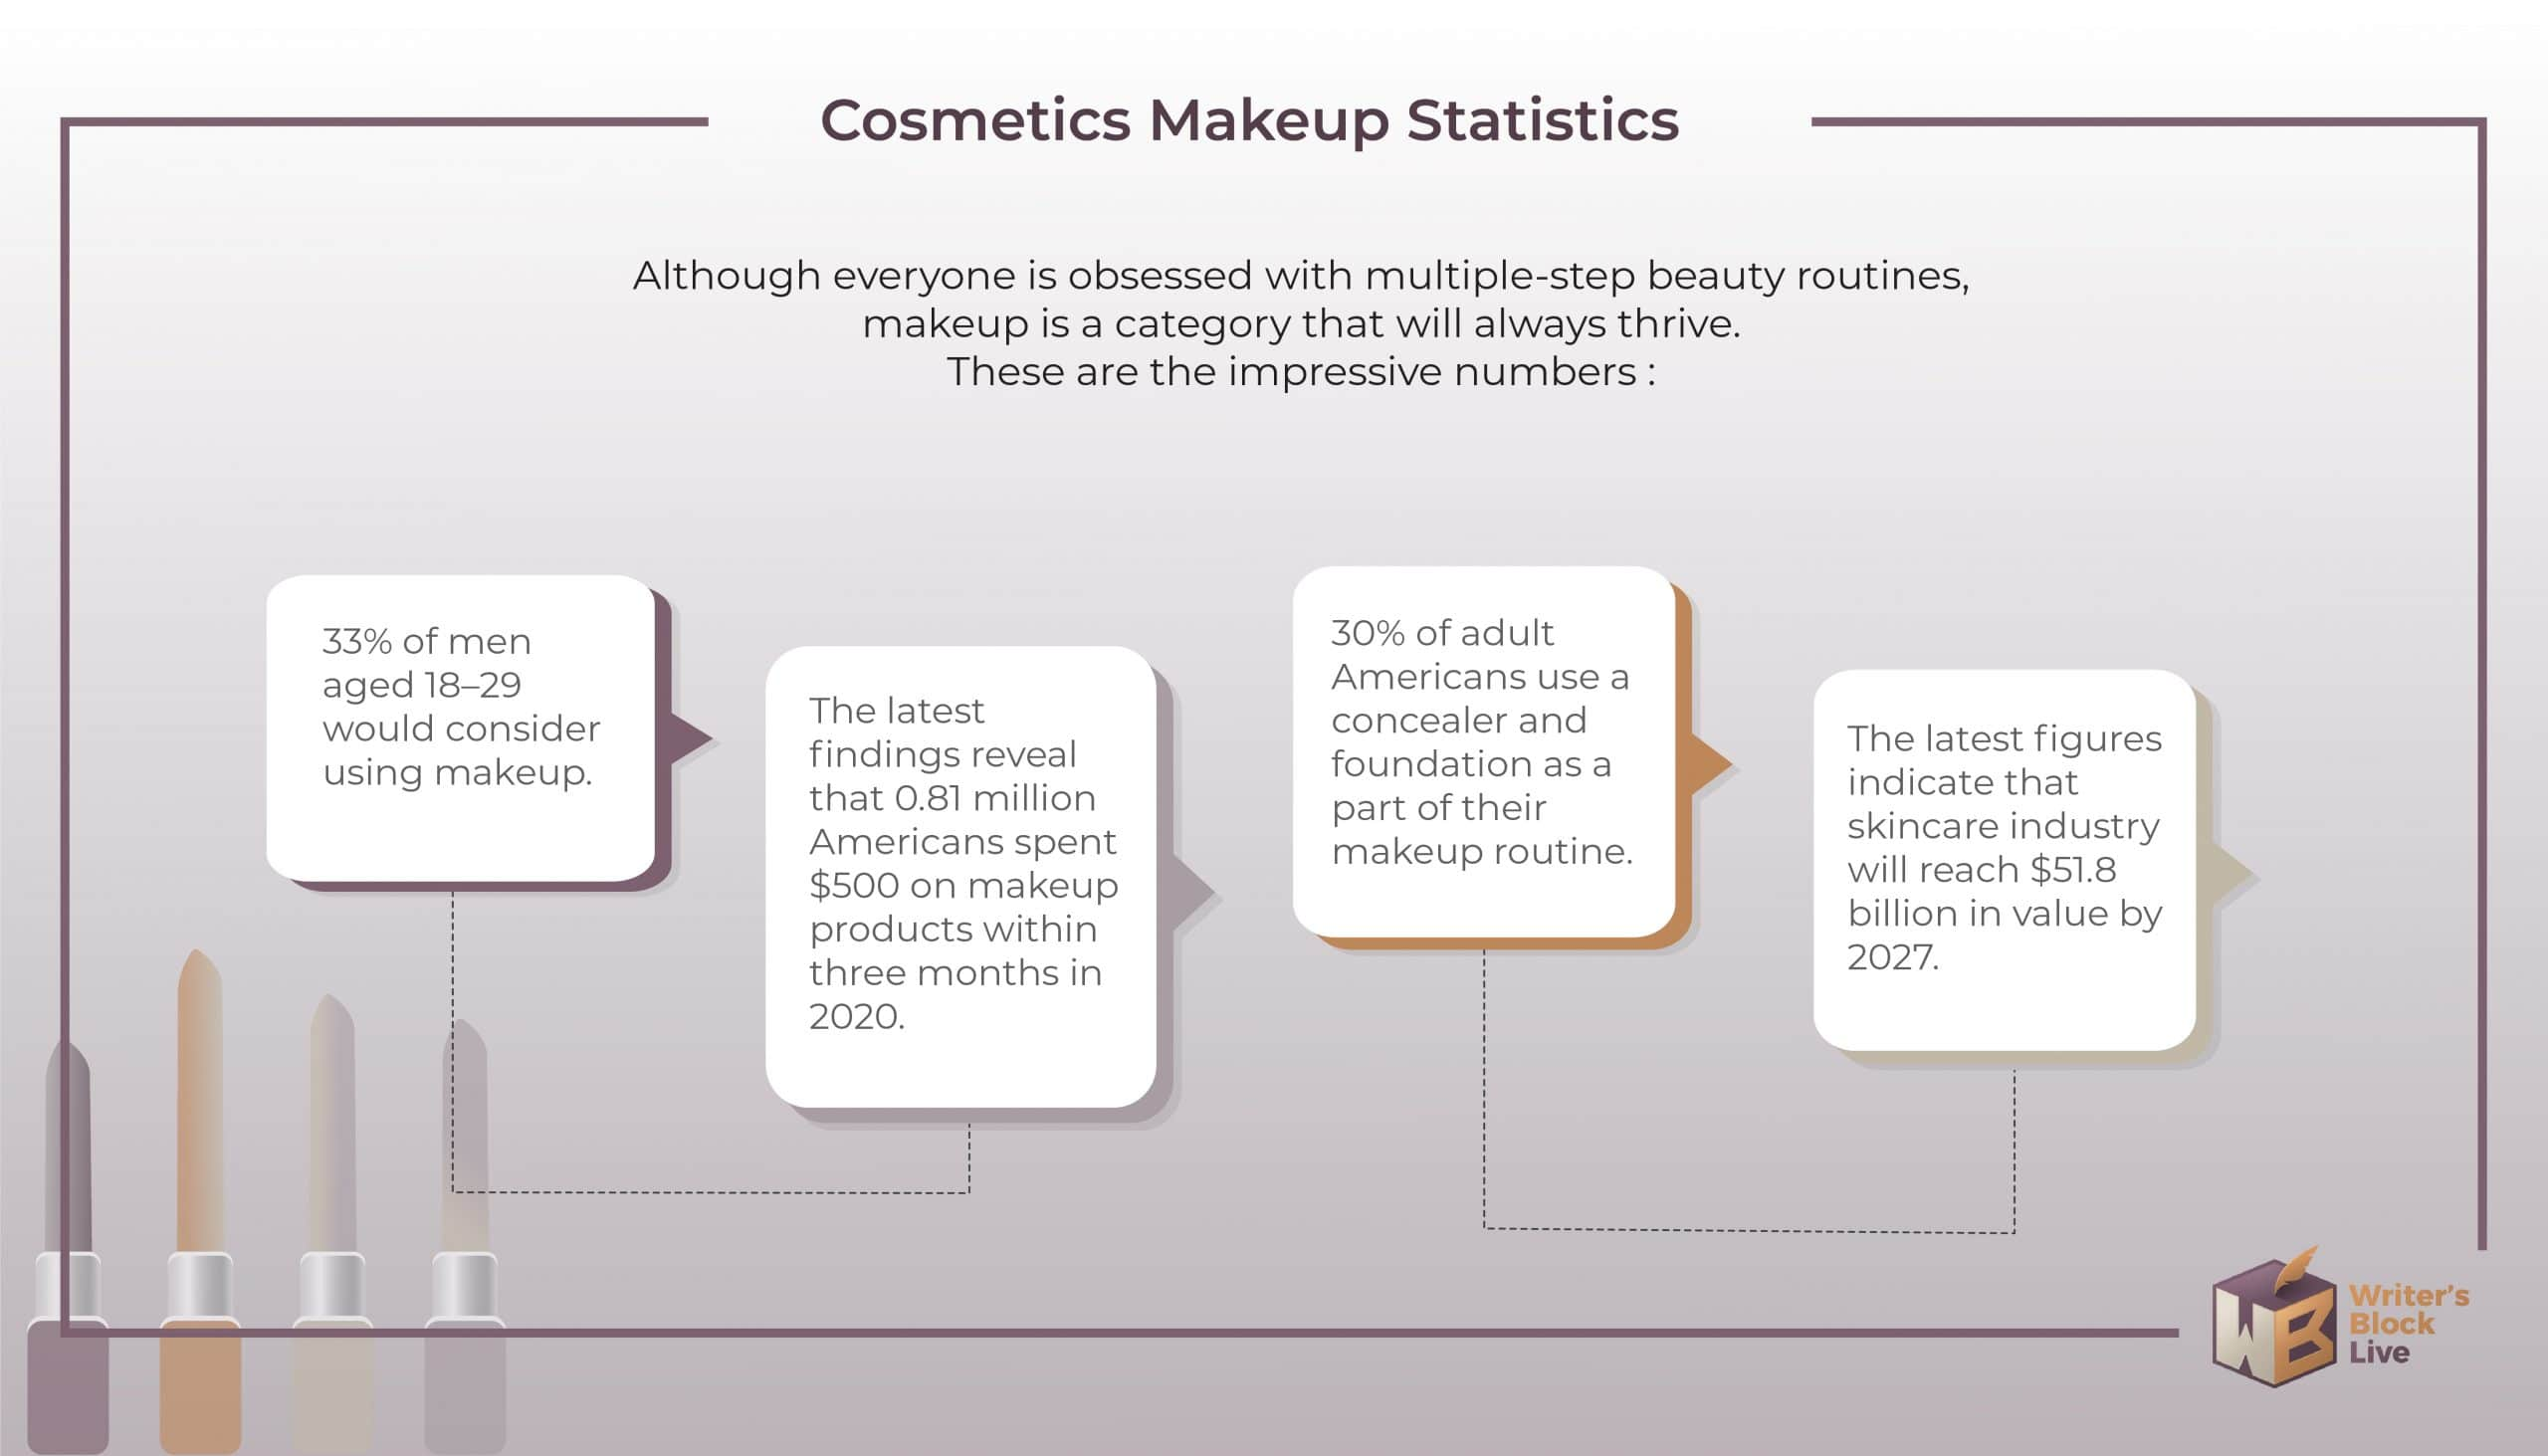 Cosmetics Makeup Statistics